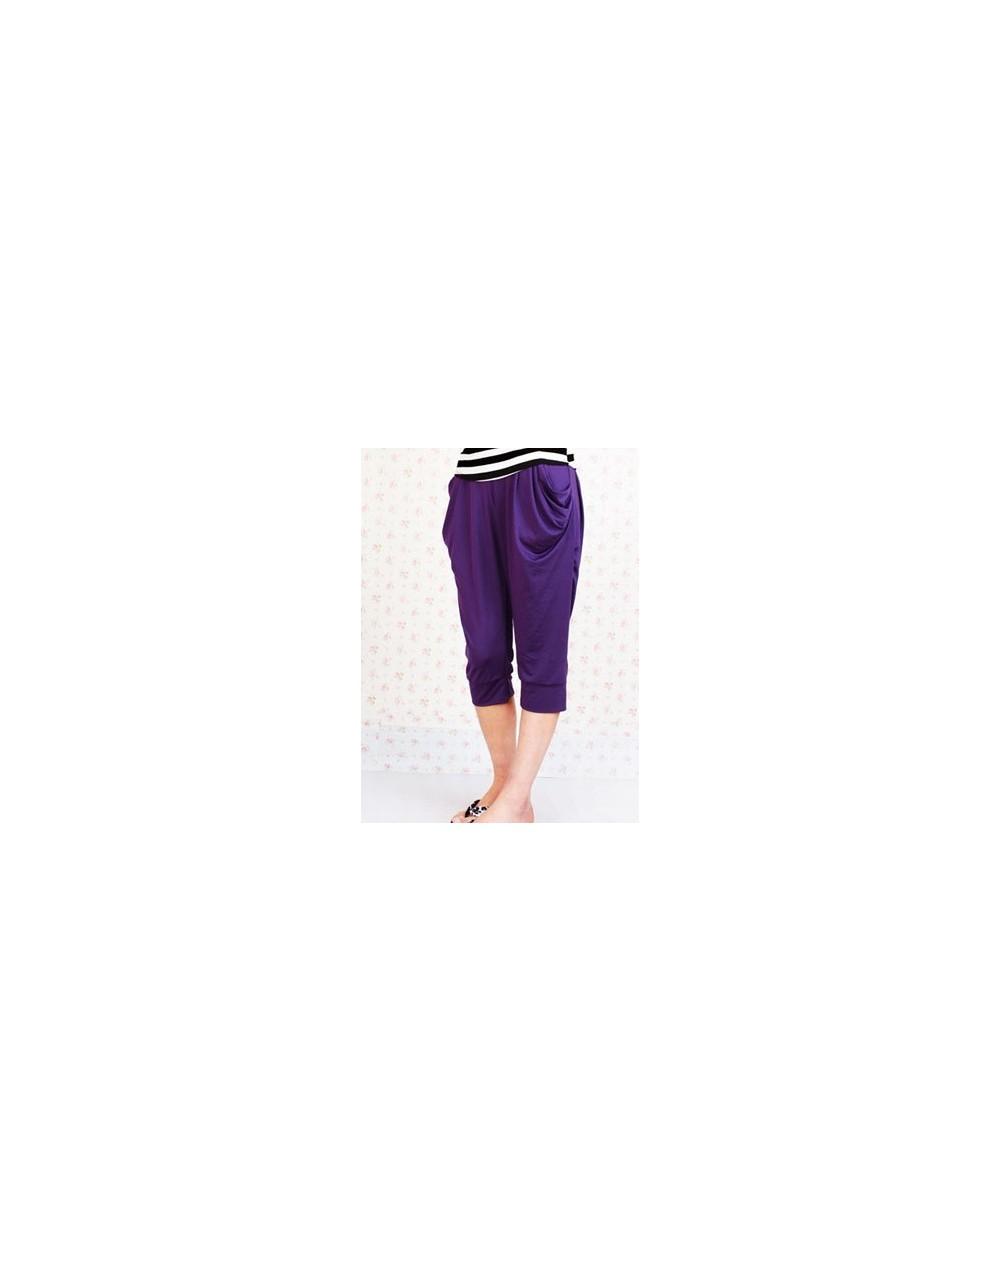 Plus Size Women Capris Casual Harem Pants Candy Color Trousers Female Trousers Knee Length Pants Female Summer Hot Sale - W0...